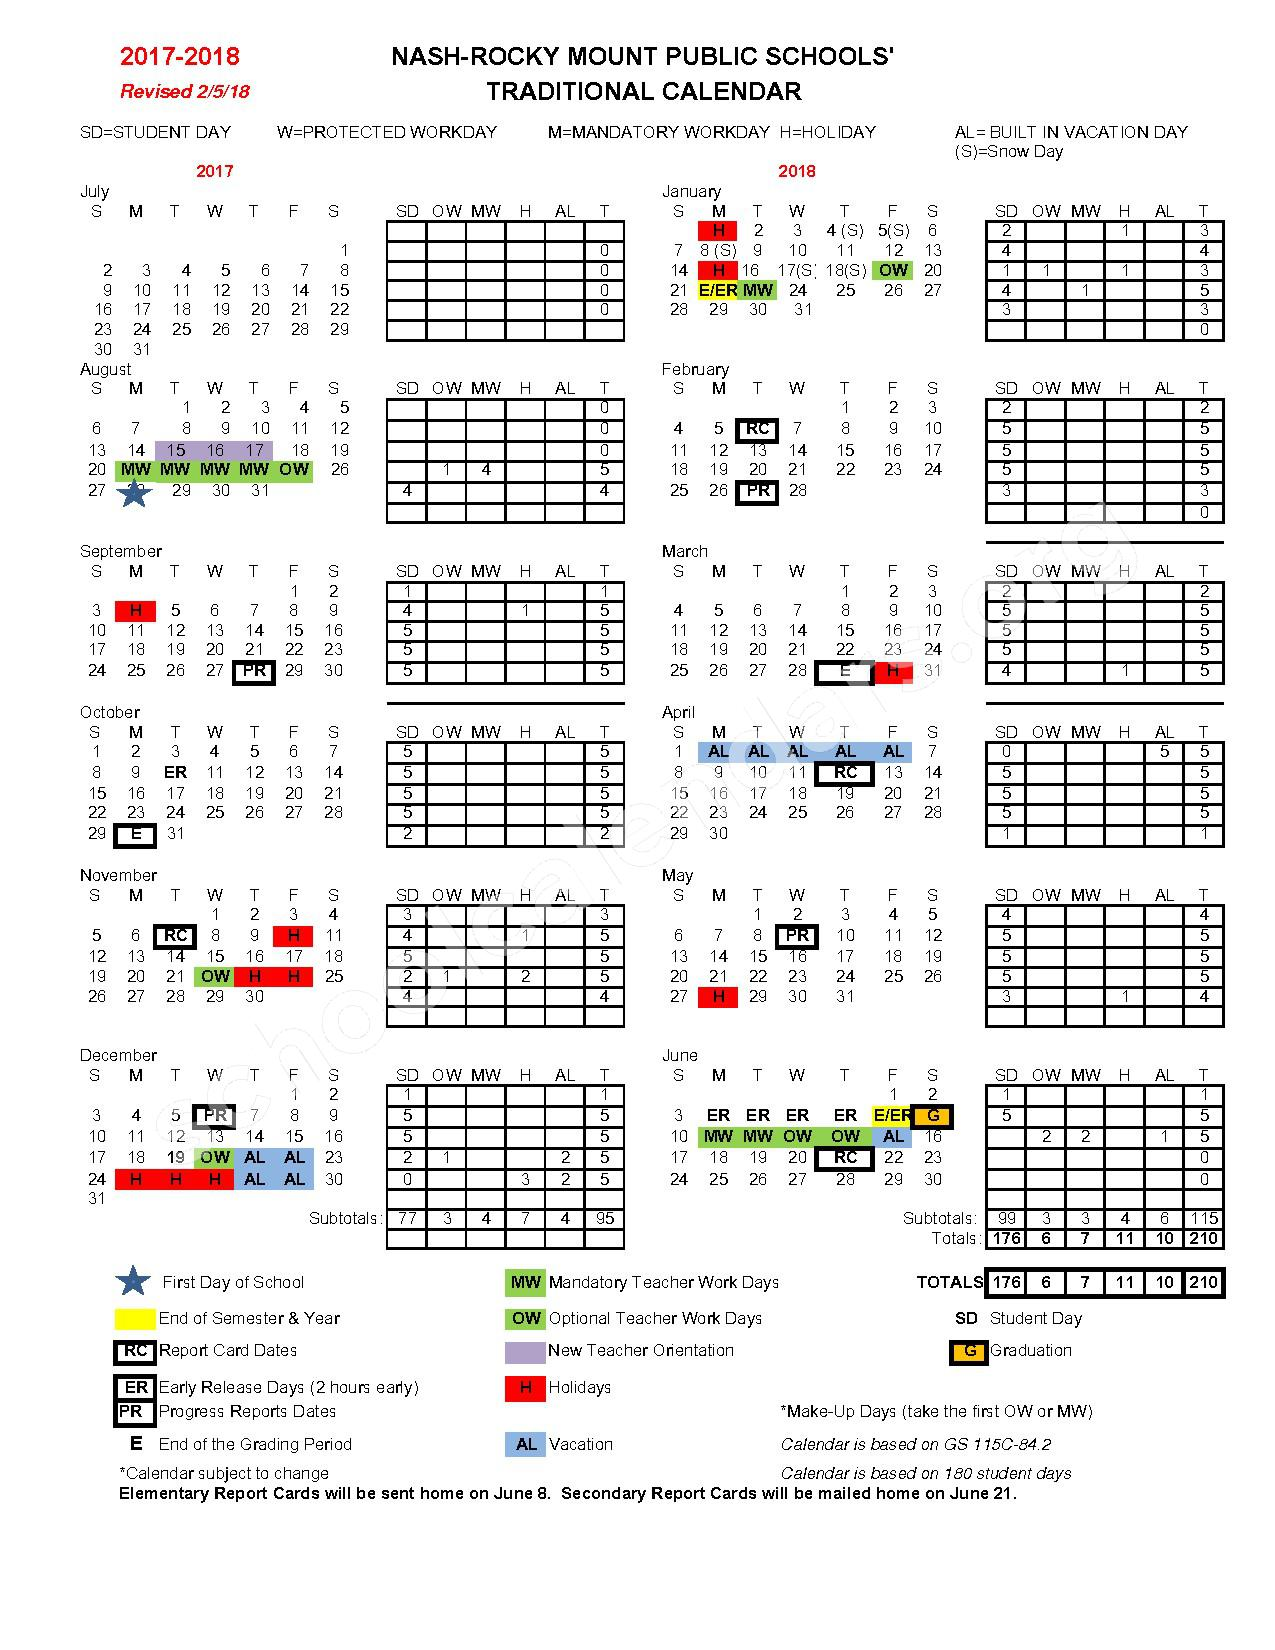 2017 - 2018 Revised Traditional Calendar – Nash-Rocky Mount Public Schools – page 1